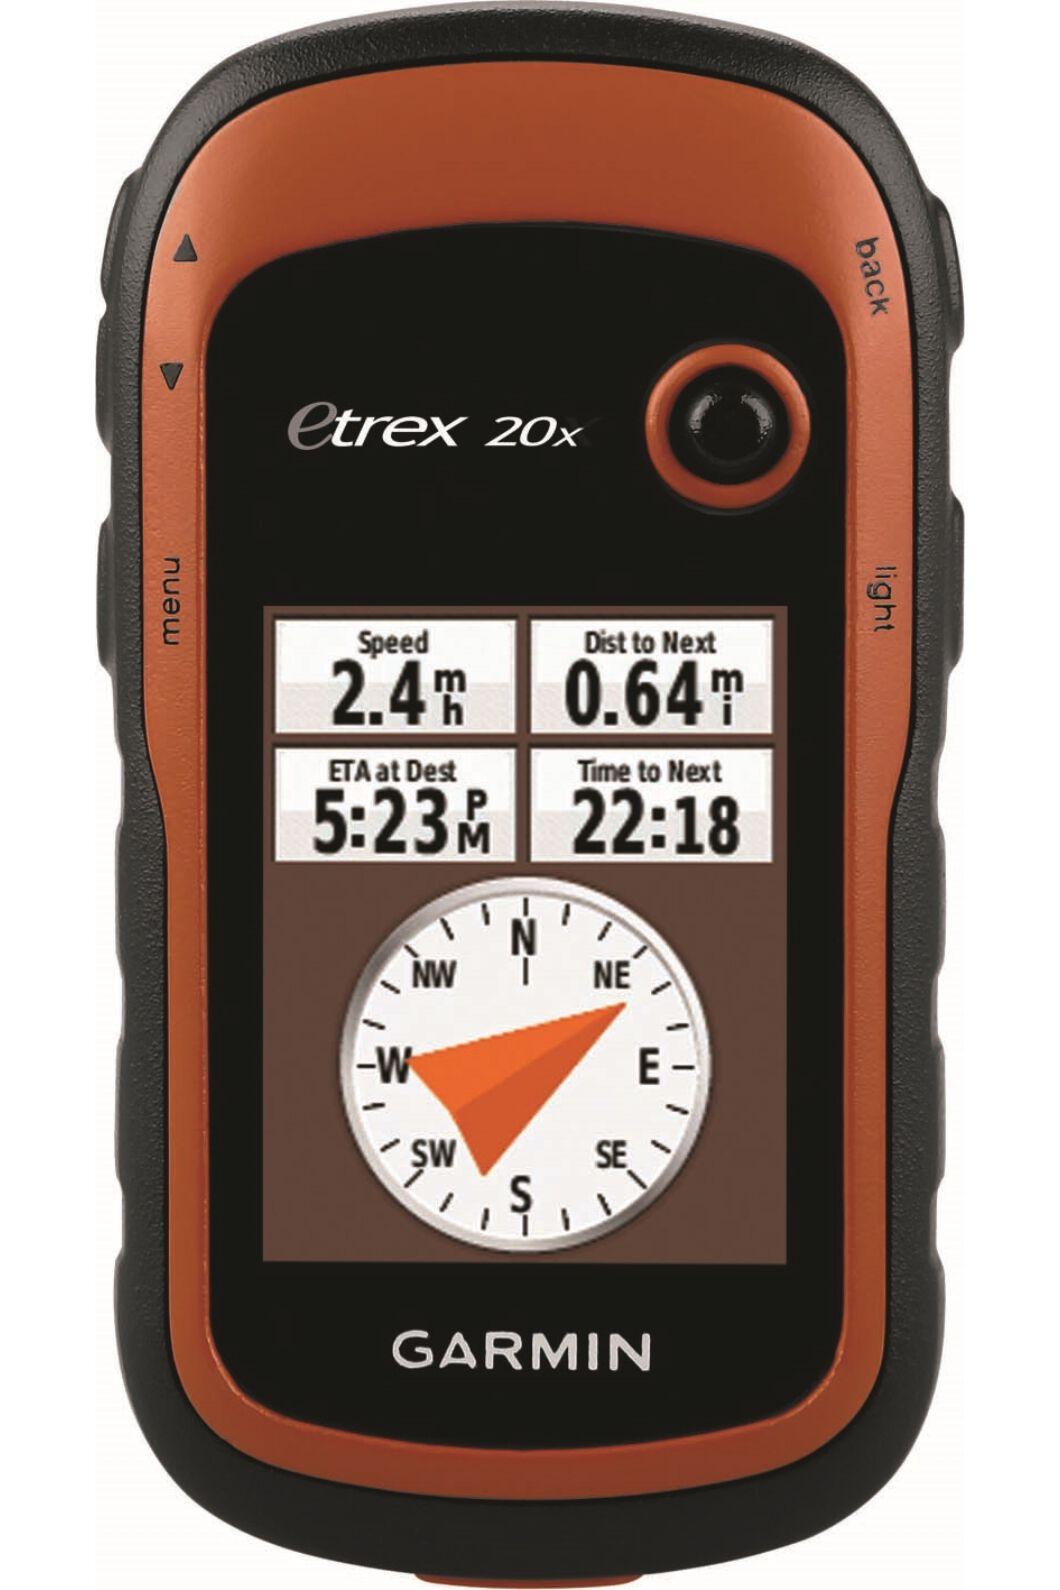 Garmin eTrex 20X Handheld GPS, None, hi-res